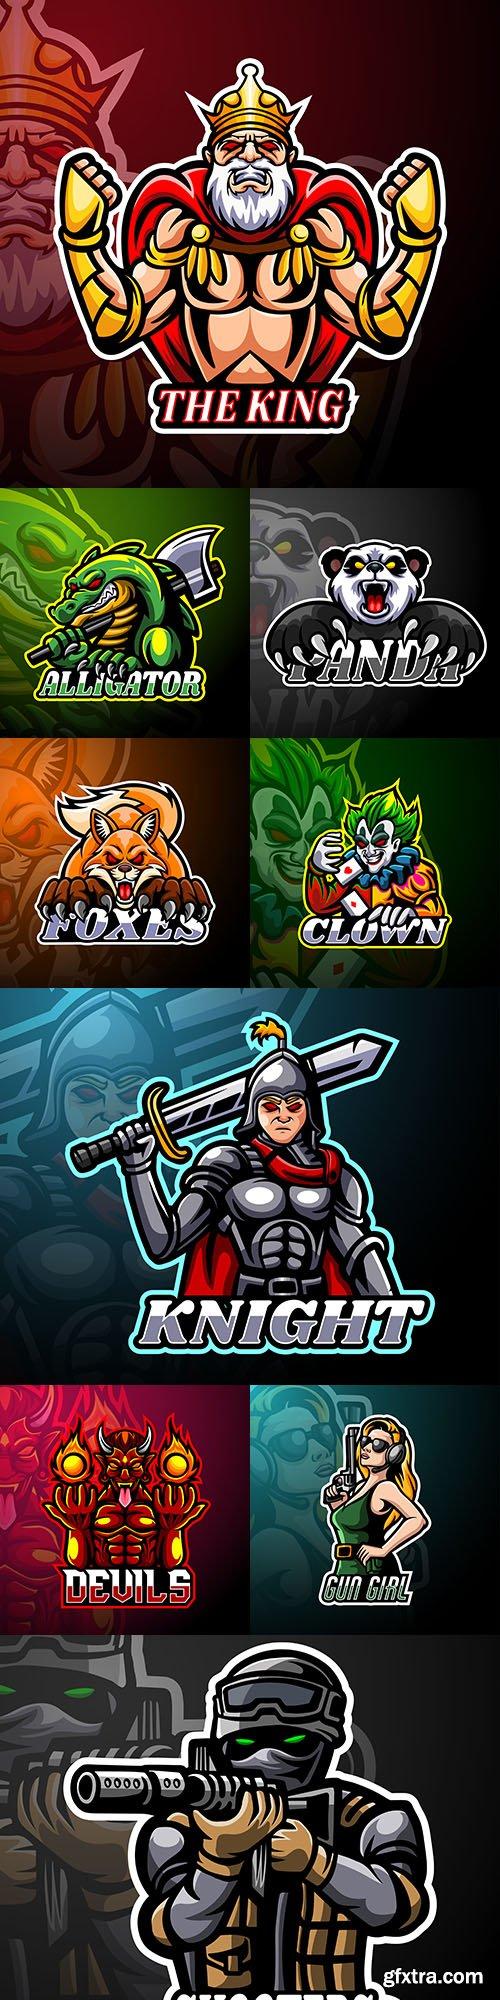 Cybersport mascot design logo illustration 12